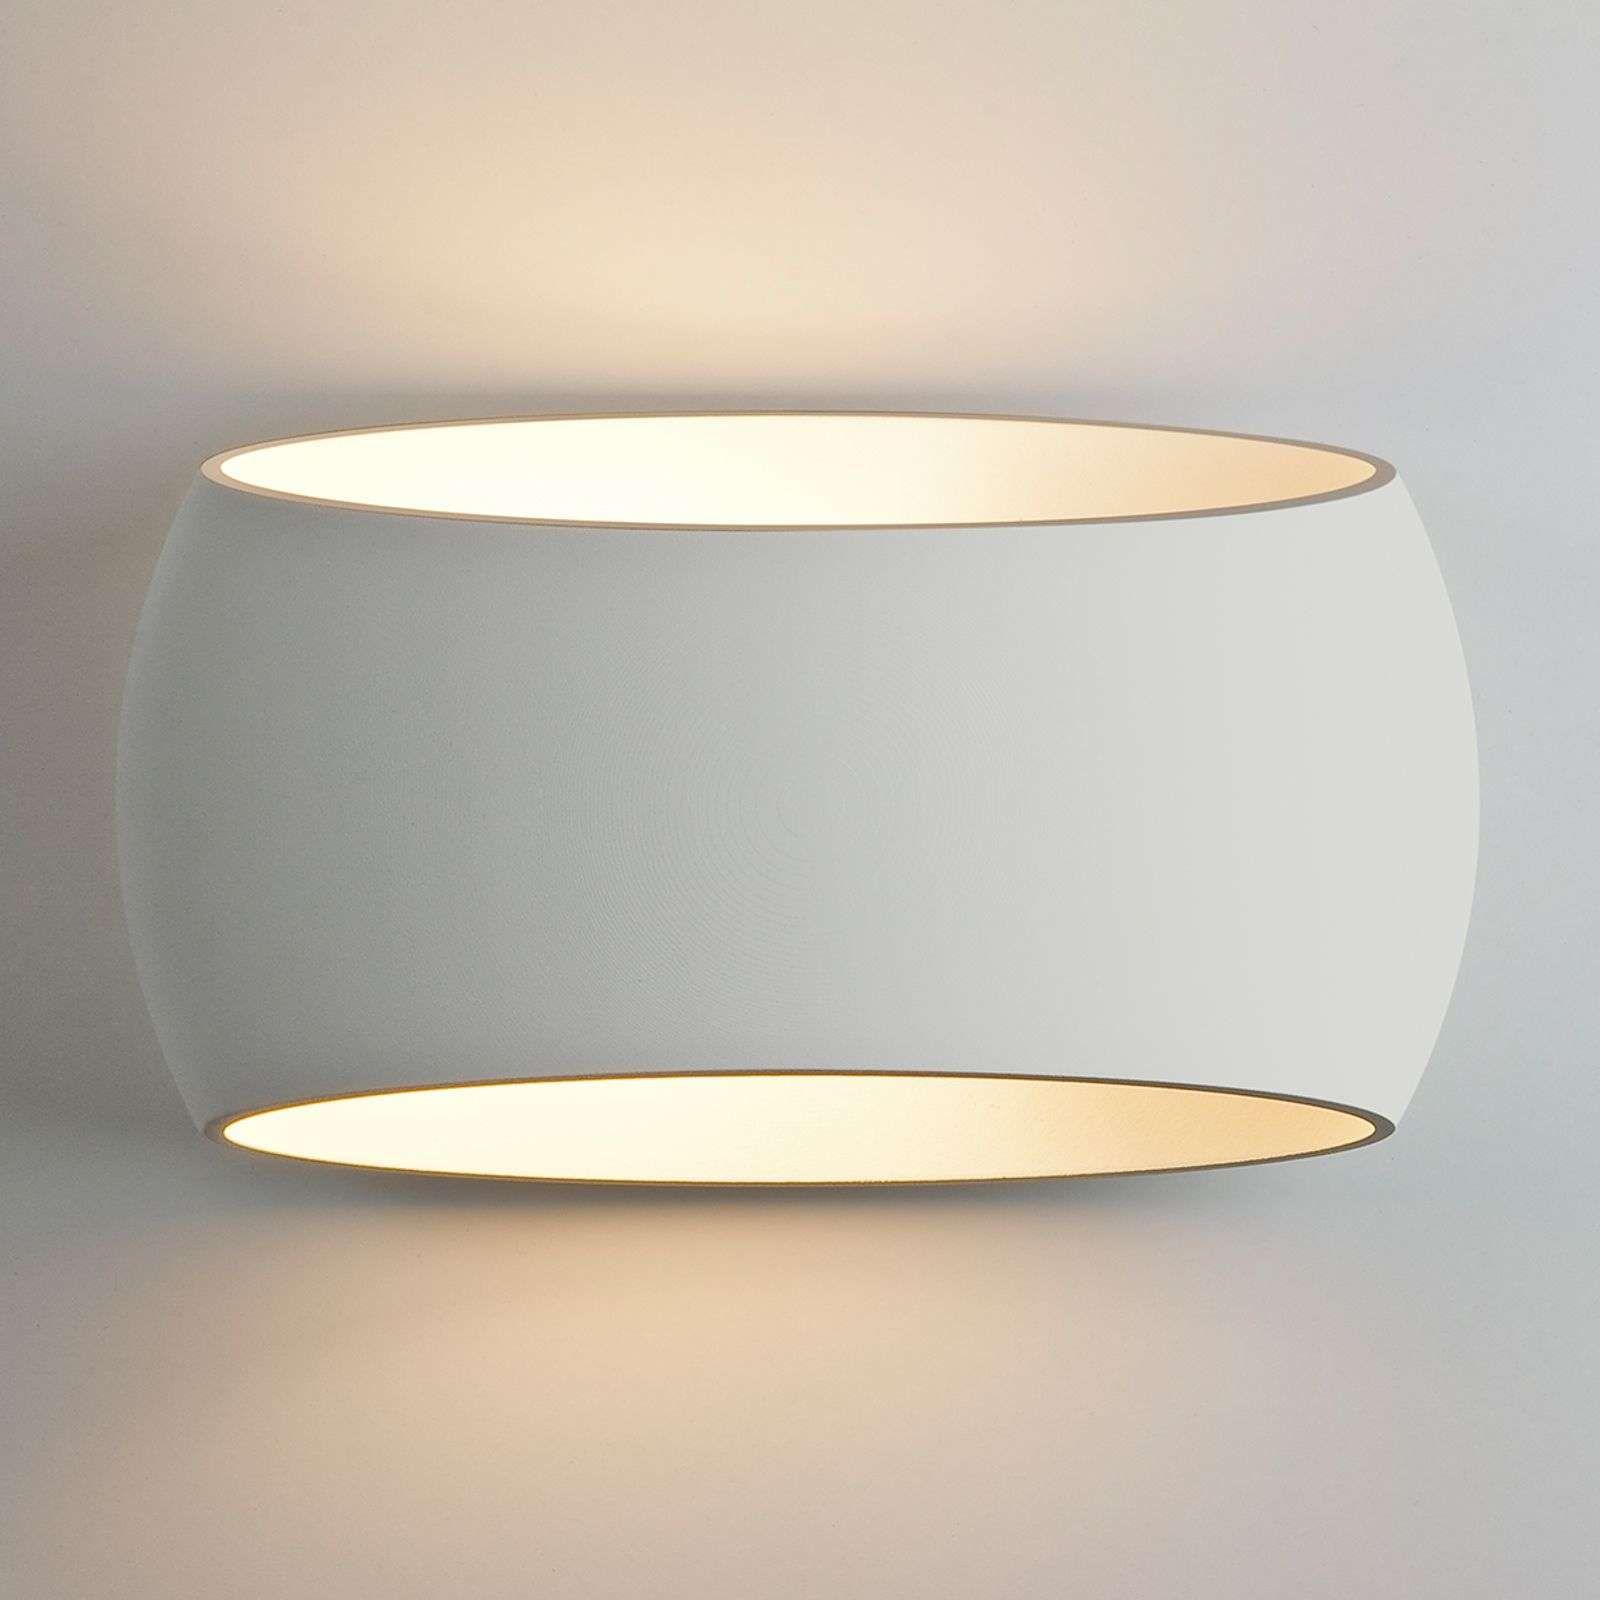 Applique Aria En Platre A Peindre In 2020 Wandlamp Muurverlichting Huisdesign